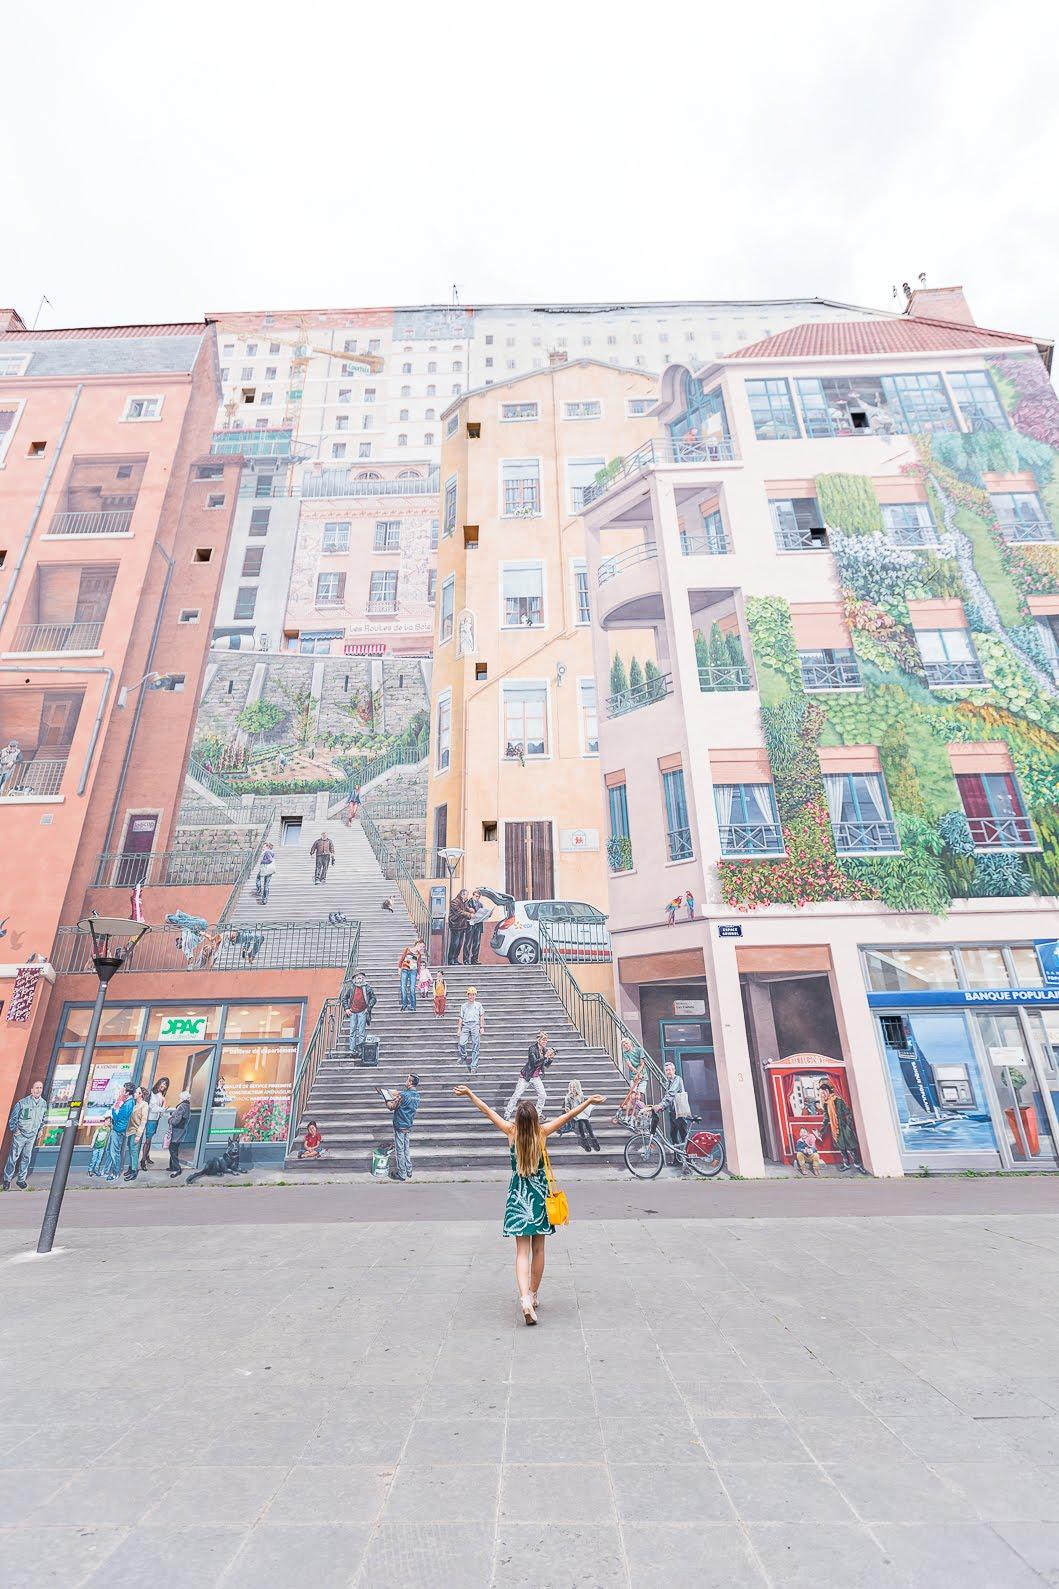 Lyon mur des canuts